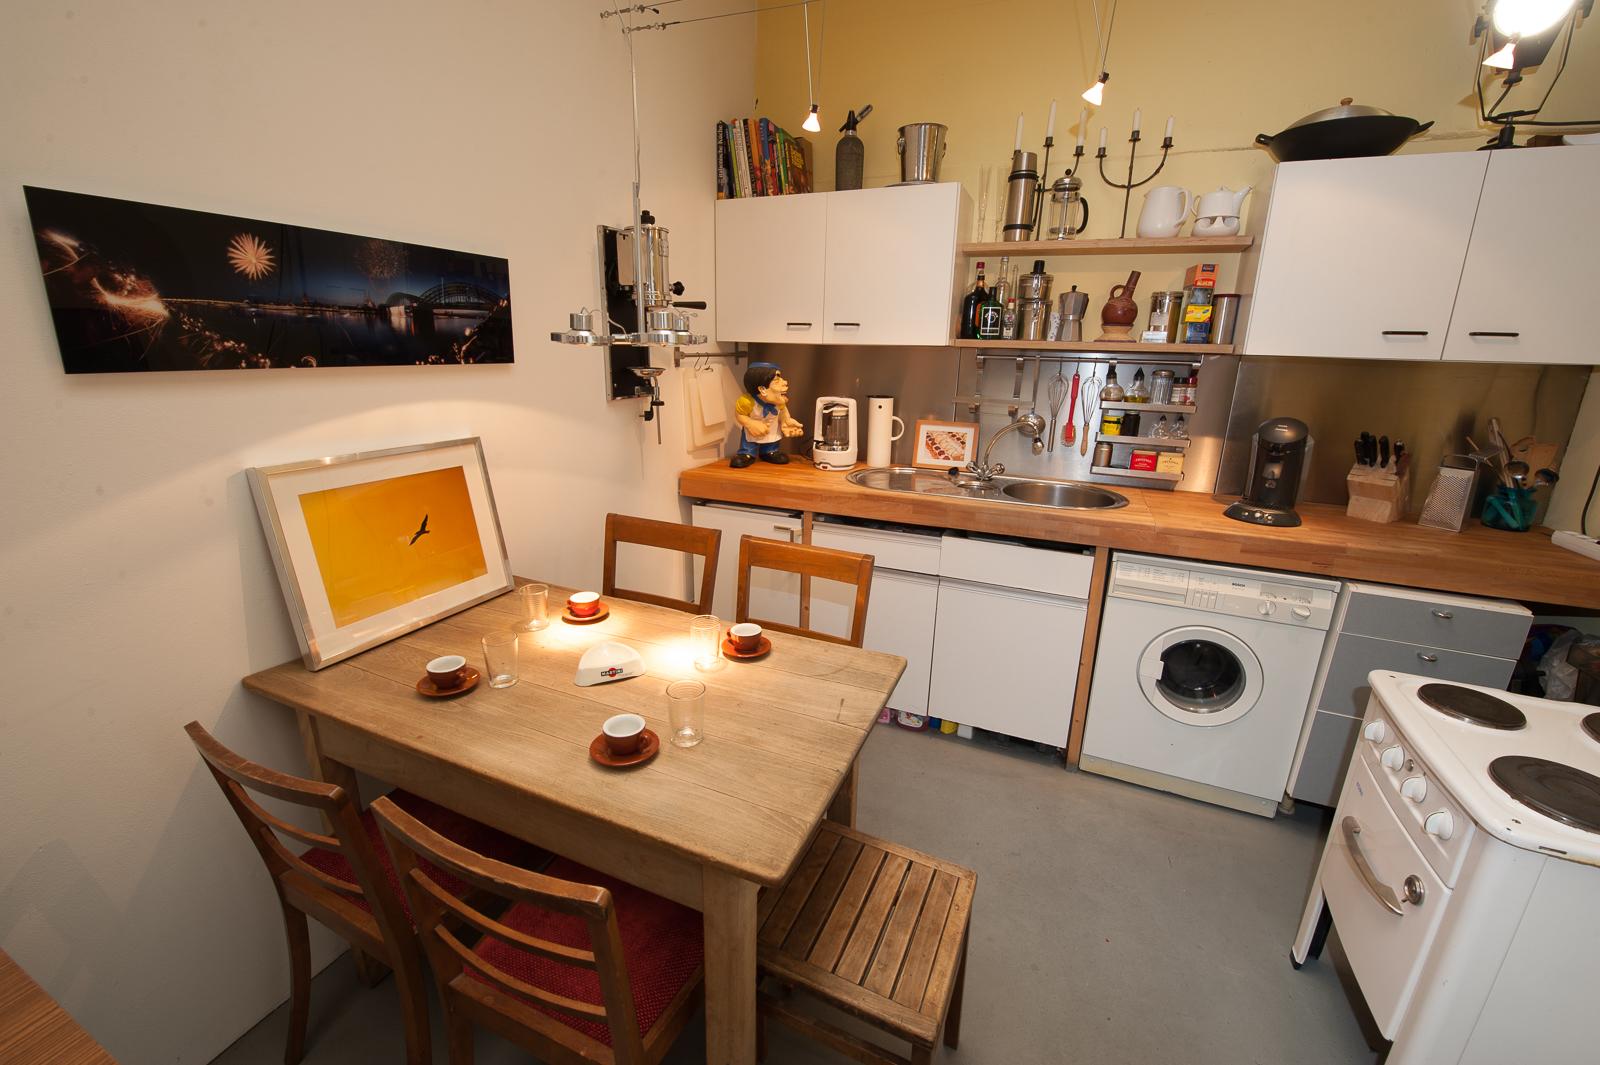 mietstudio das mietstudio im herzen von k ln. Black Bedroom Furniture Sets. Home Design Ideas